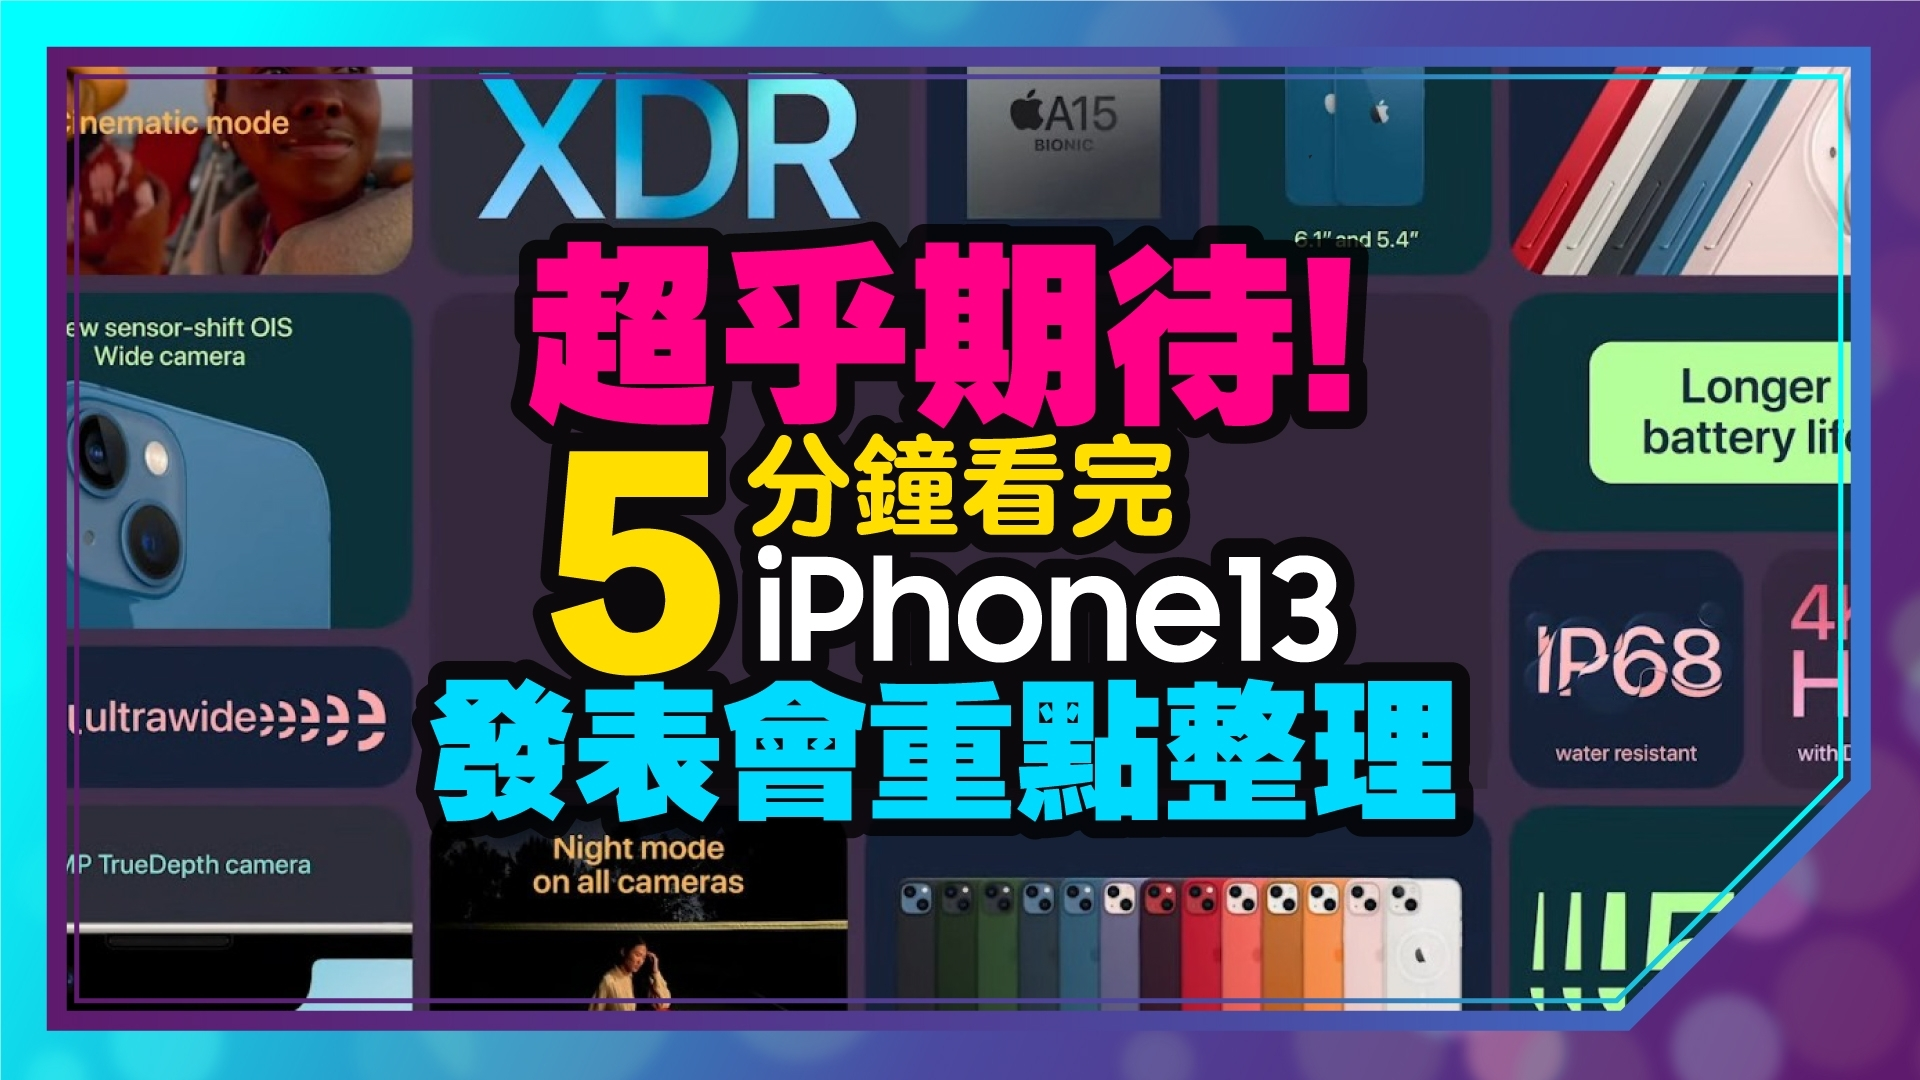 Apple iPhone 13蘋果發表會5分鐘重點懶人包:iPad mini6、iPhone13、iPhone13 Pro、iPad 9、Apple Watch S7